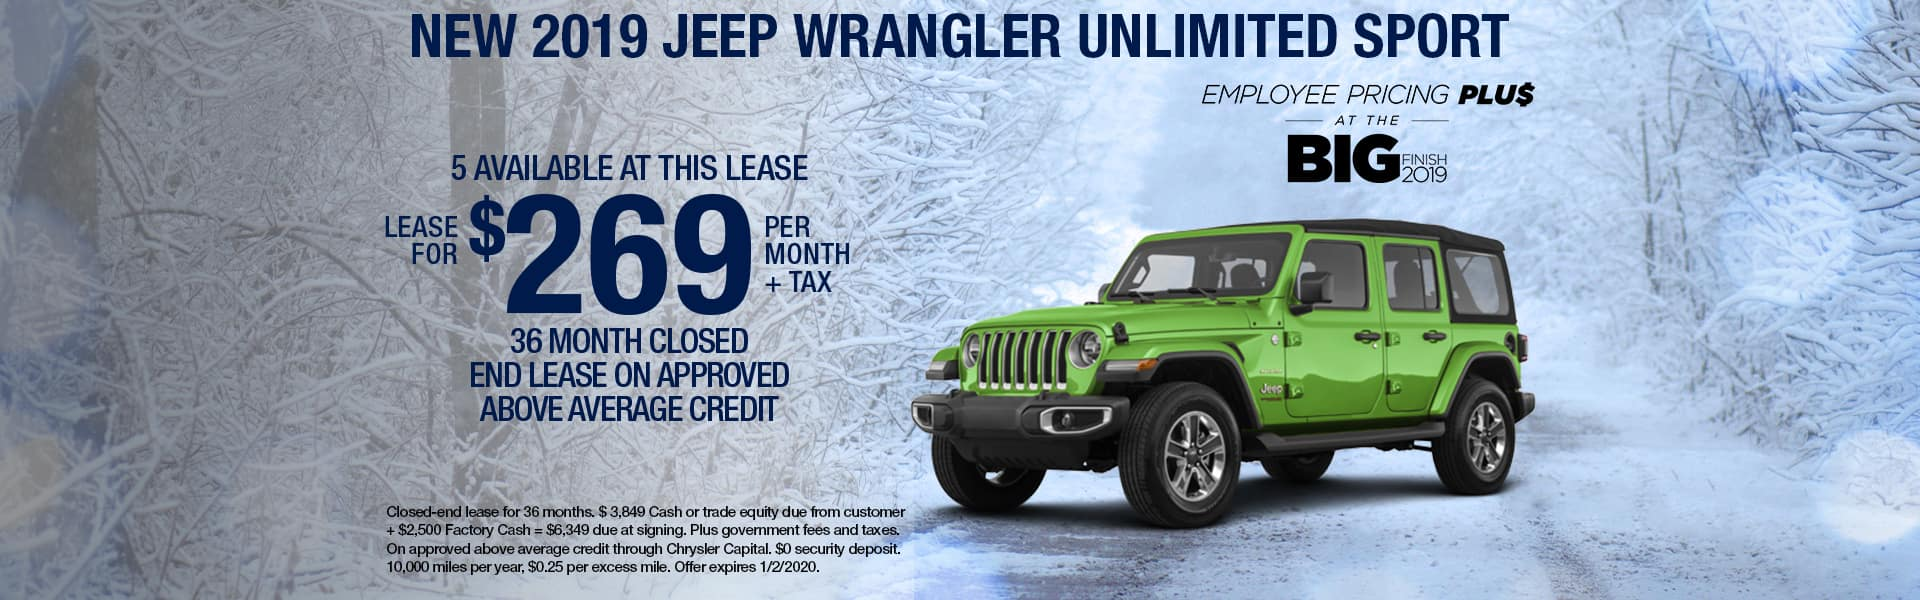 San Diego Jeep Dealers >> Kearny Mesa Chrysler Dodge Jeep Ram New Used Cars Dealer